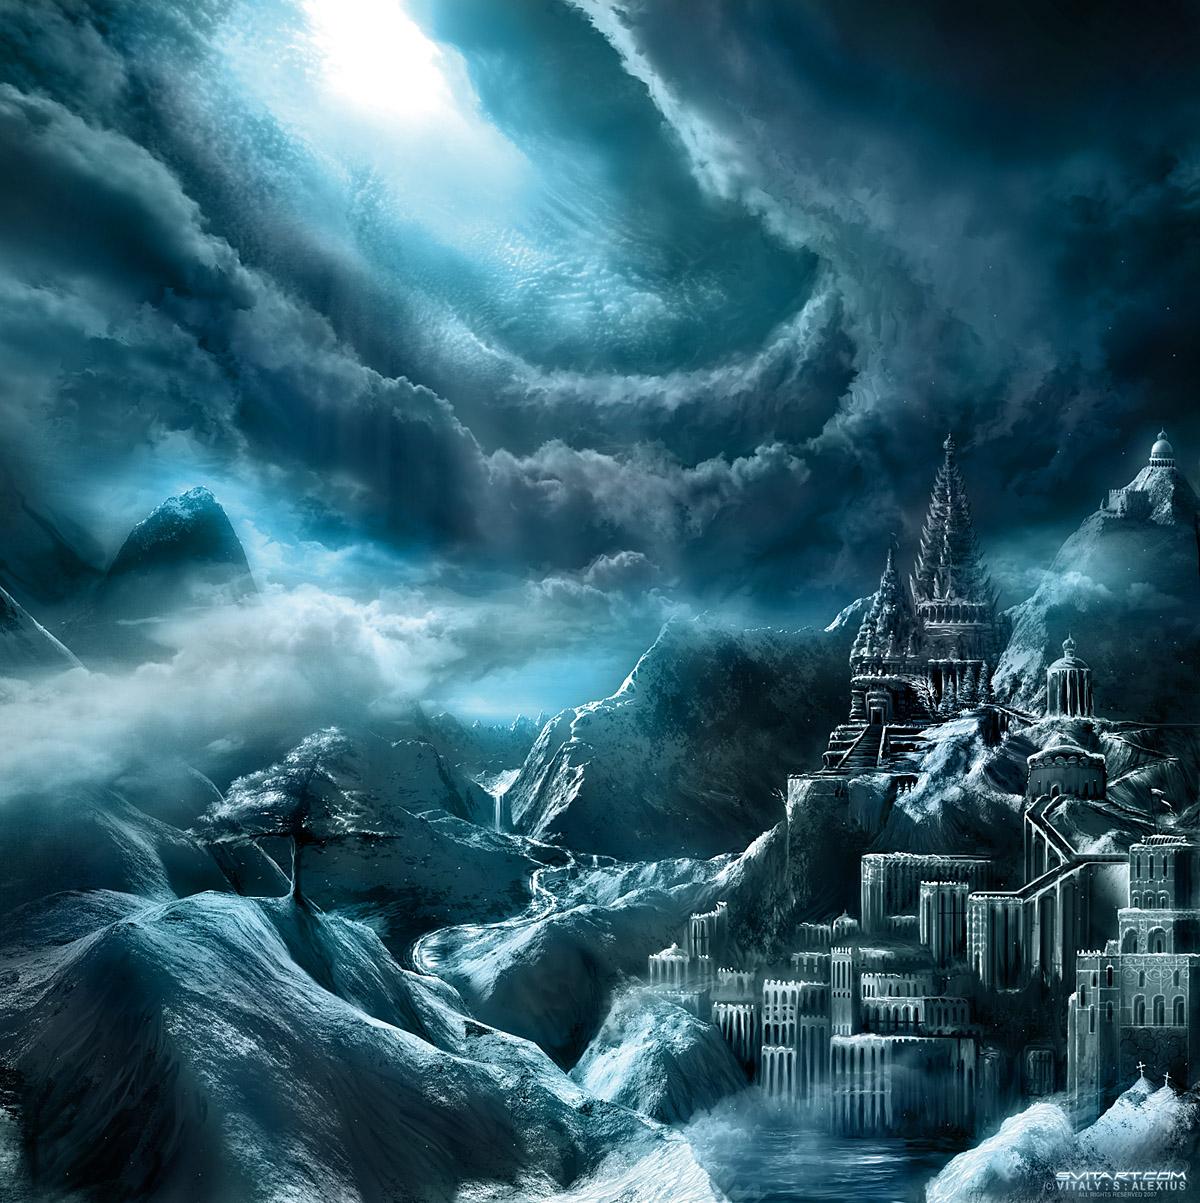 Adamant Citadel by alexiuss dans Darkness Adamant_Citadel_by_alexiuss